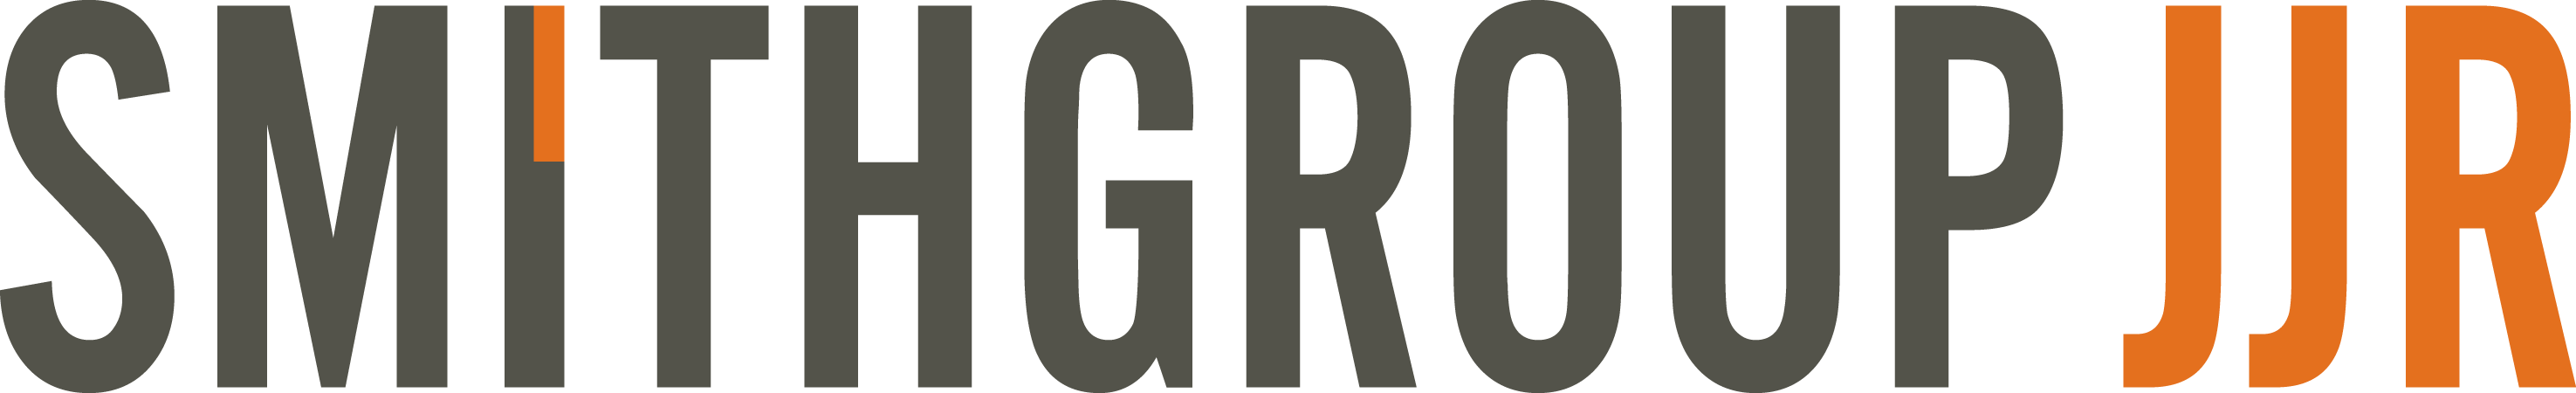 smithgroupjjr-color